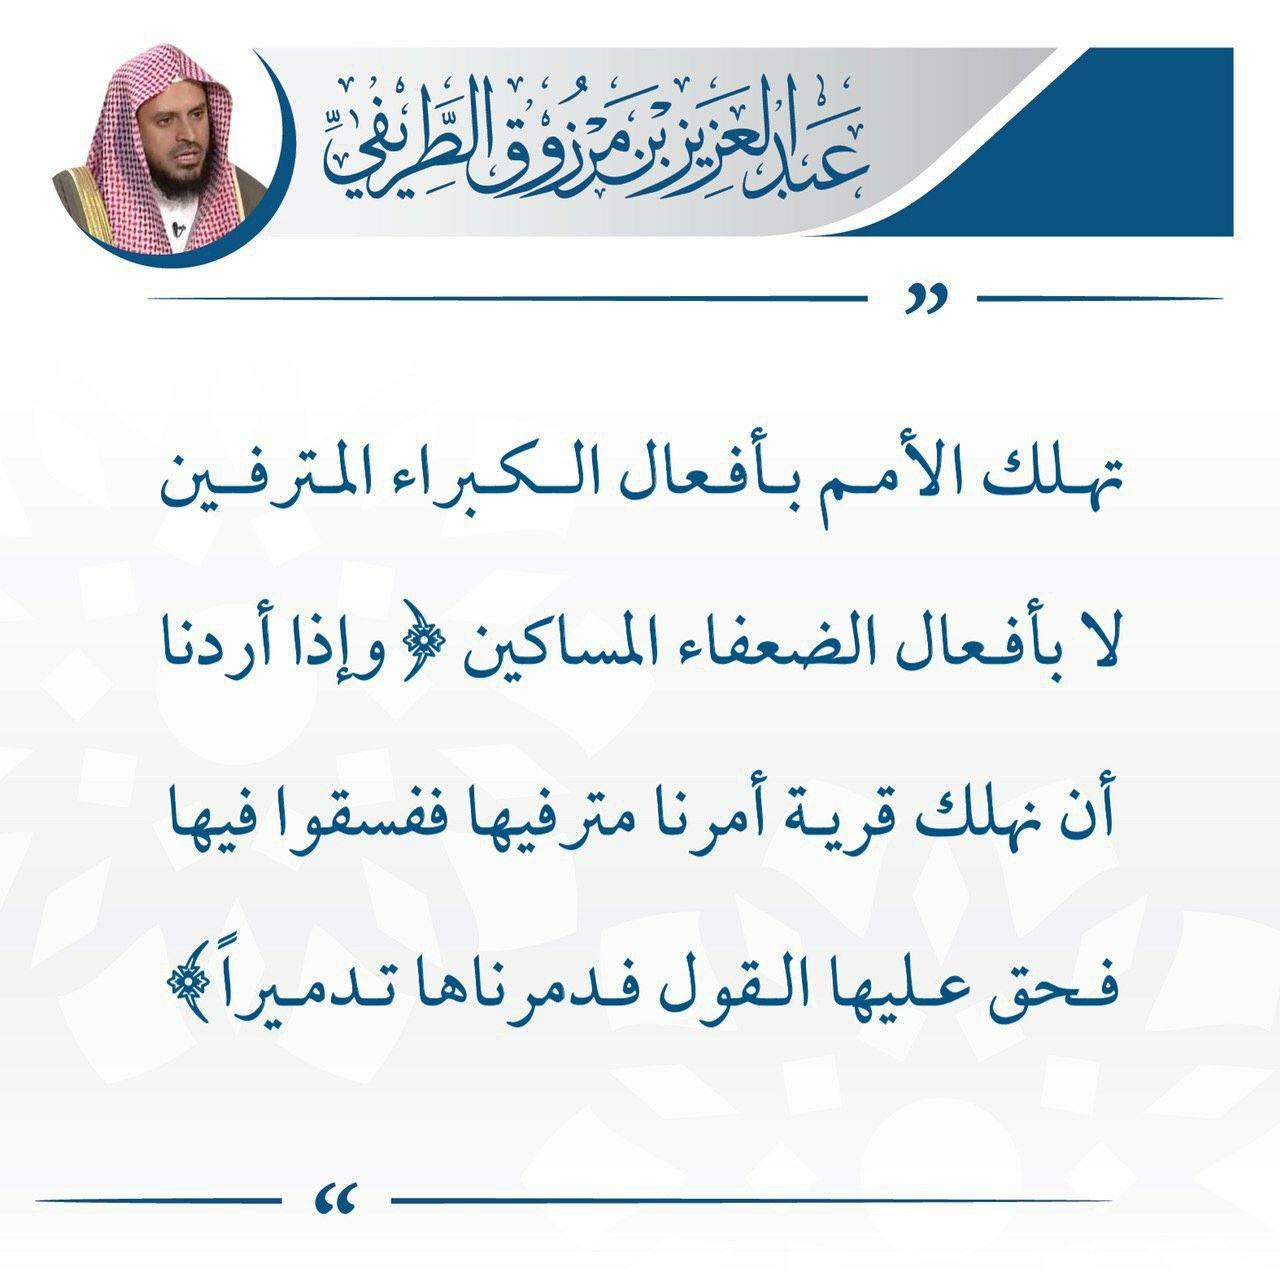 Pin By الباقيات الصالحات On فتوى عالم Quran Islam Arabic Calligraphy